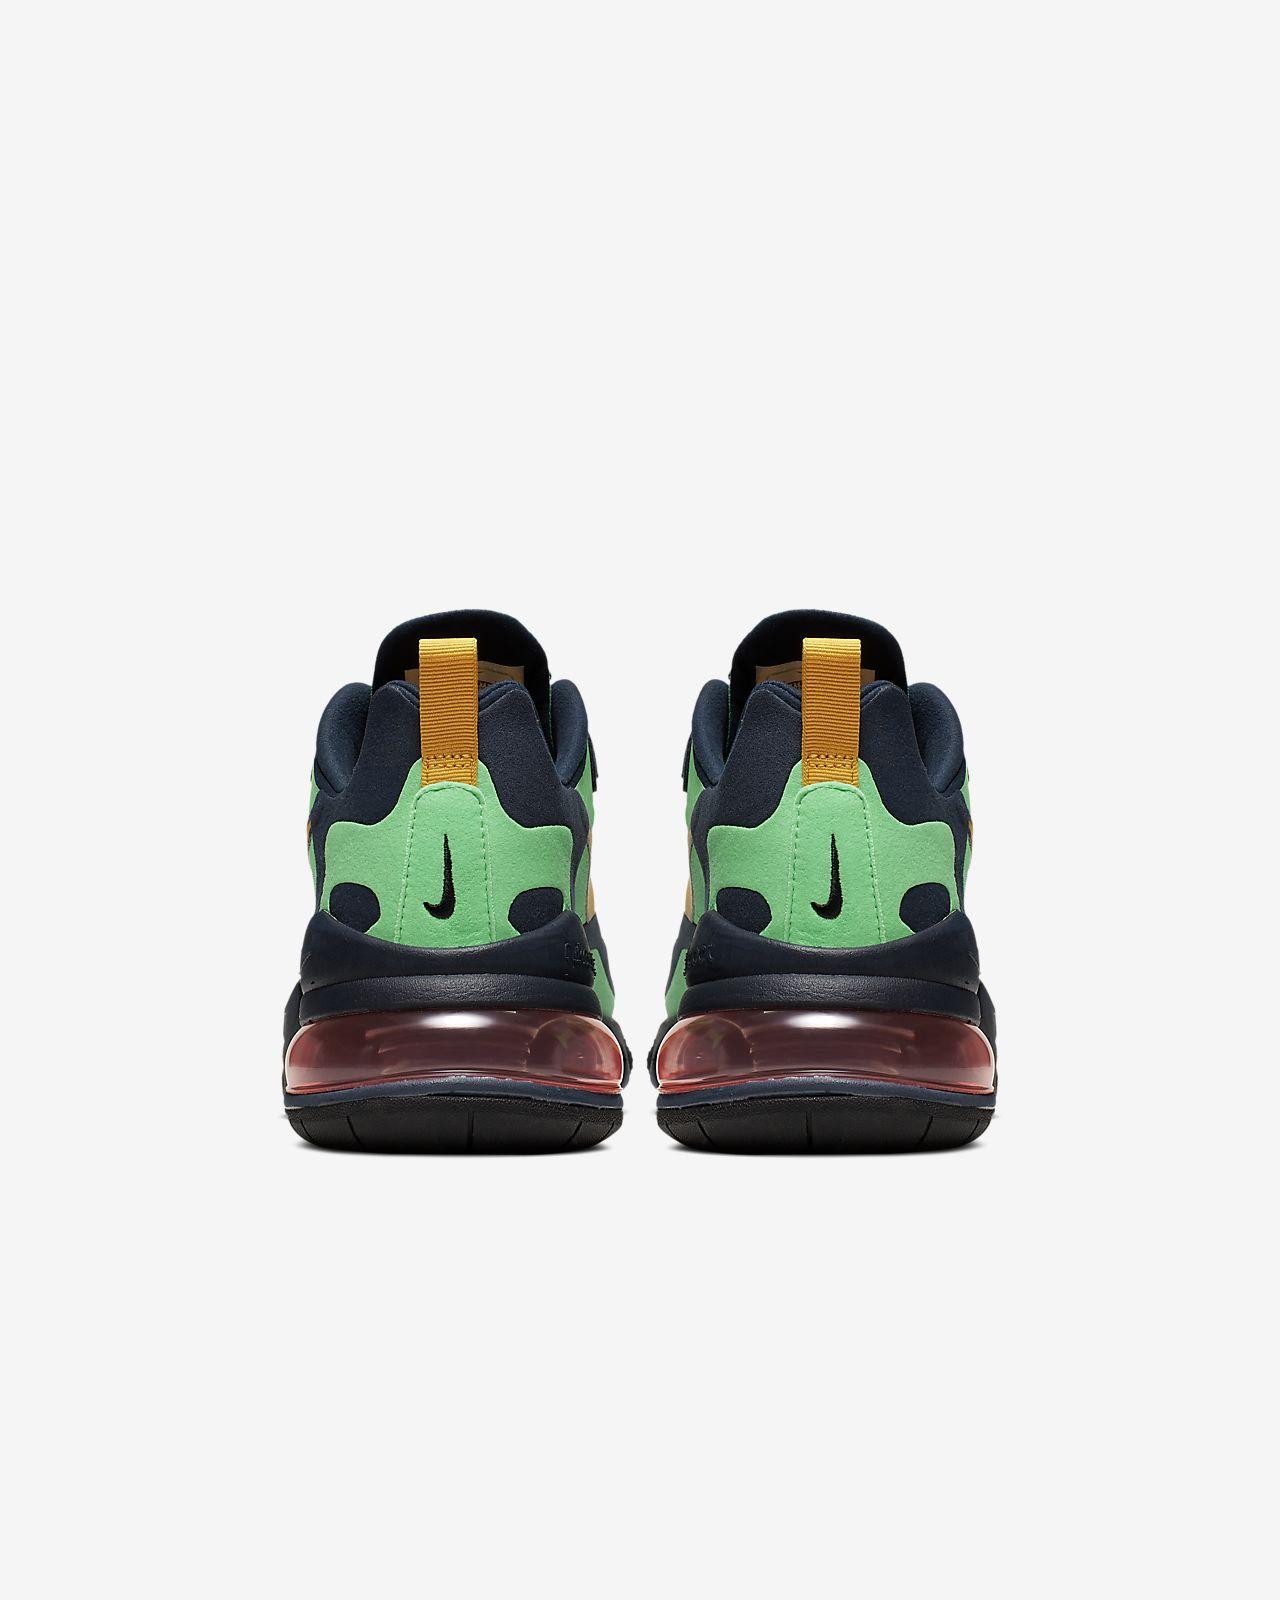 official photos d9d13 eeb96 Nike Air Max 270 React (Pop Art) Men's Shoes